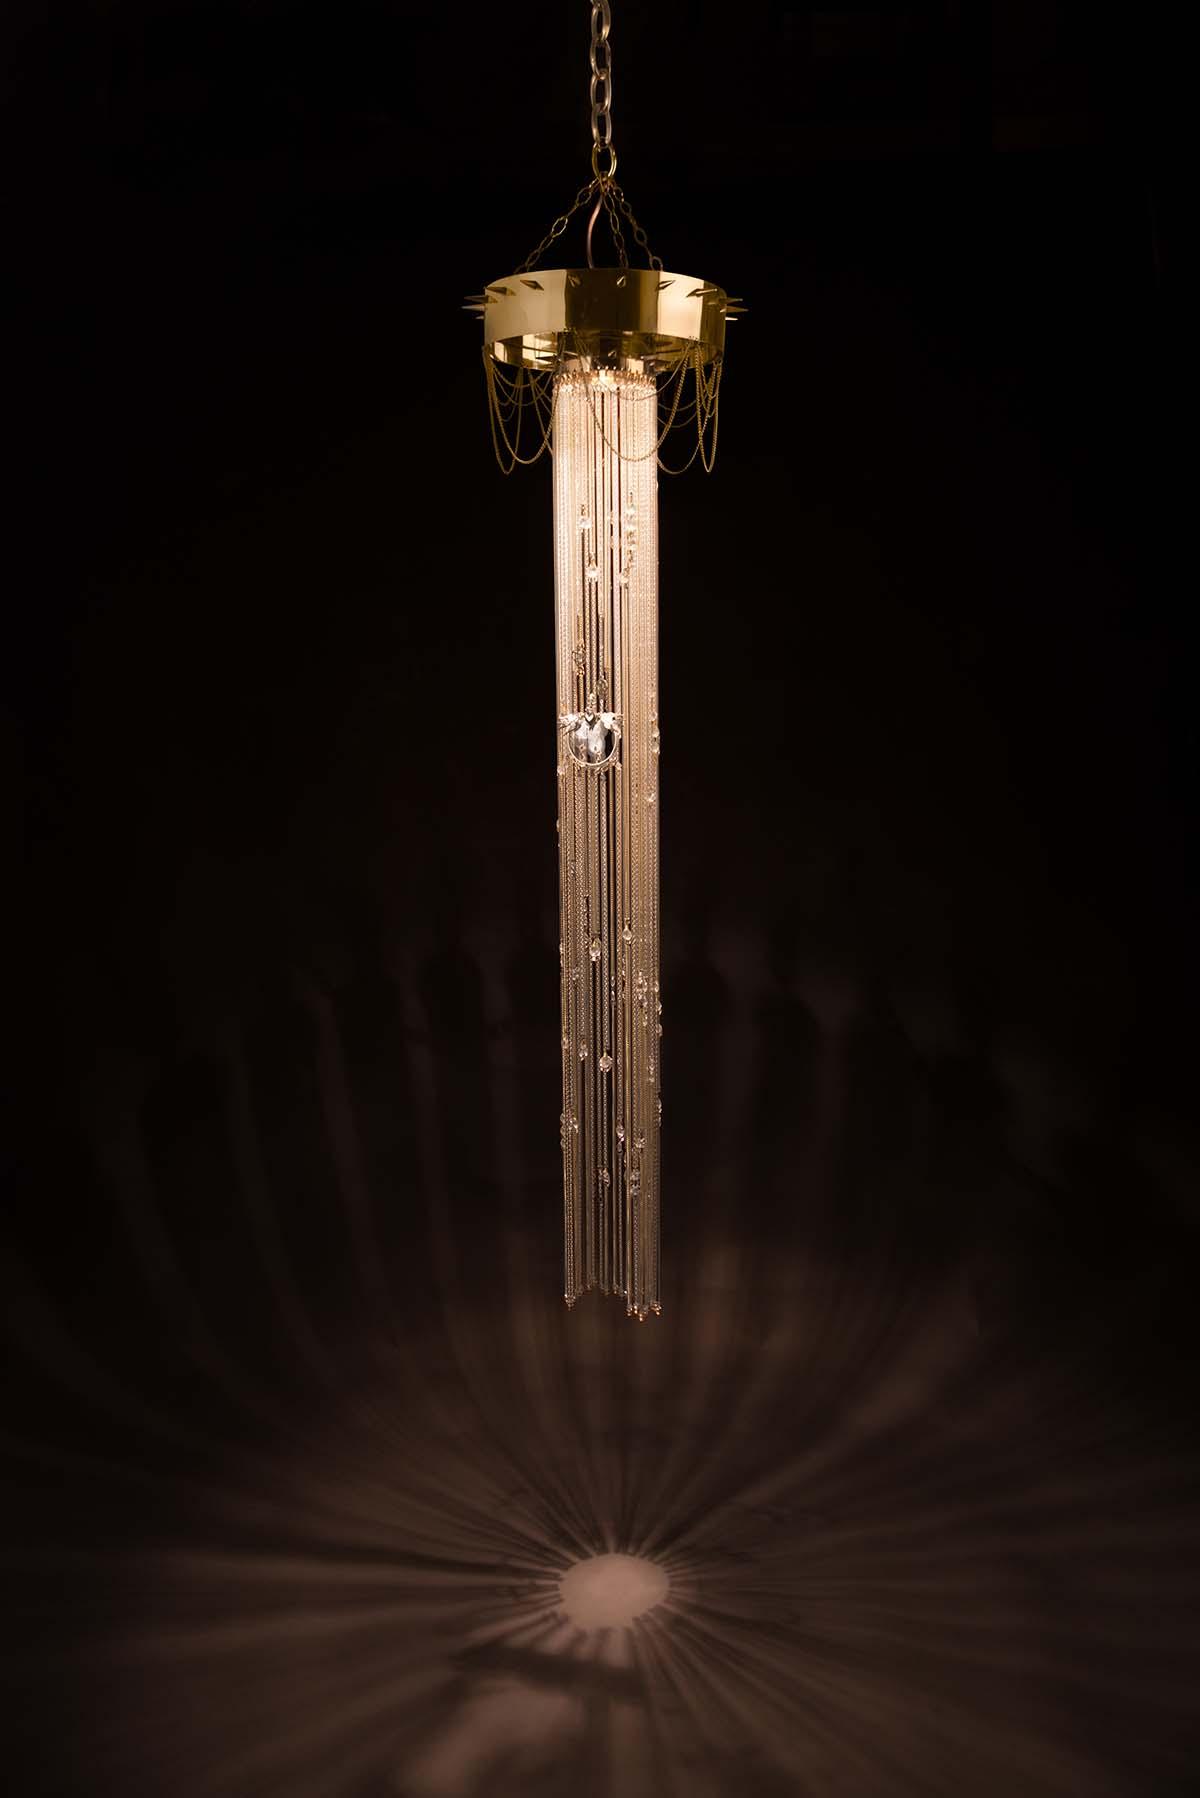 Celeste chandelier by Emerald Faerie. atmospheric lighting.